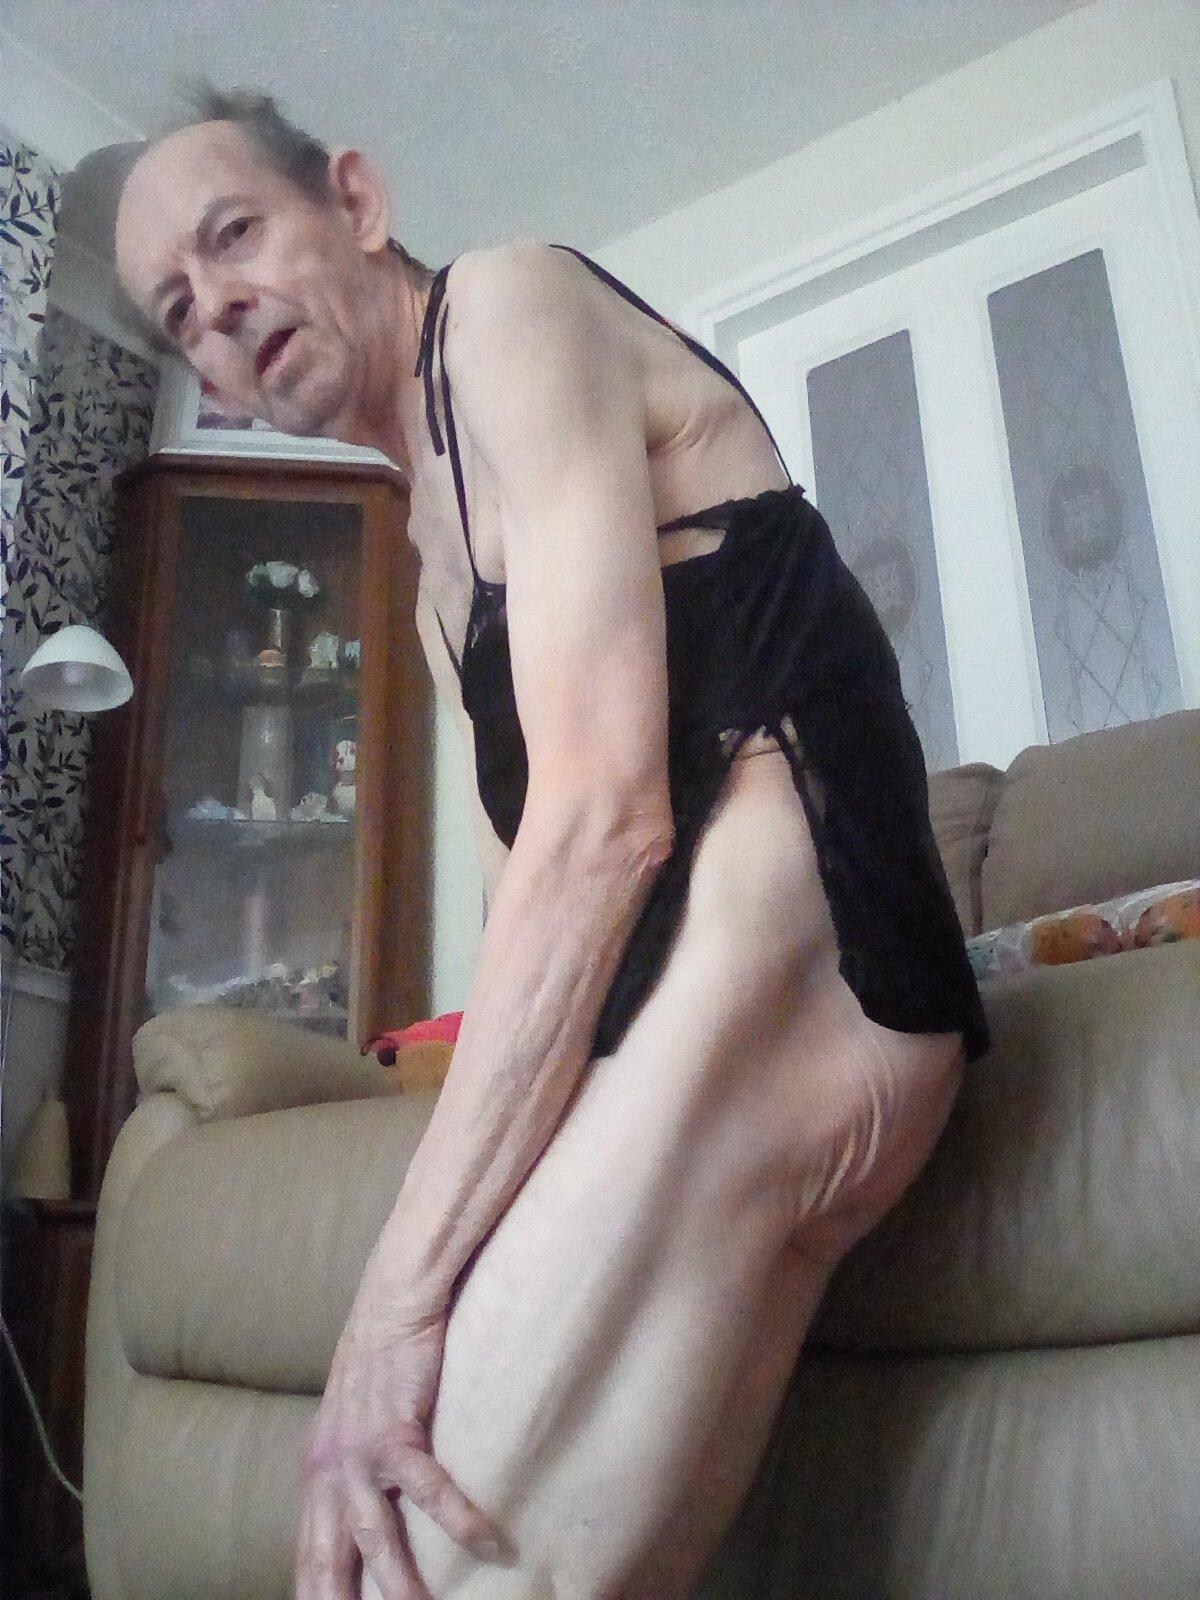 John6970 from Milton Keynes,United Kingdom